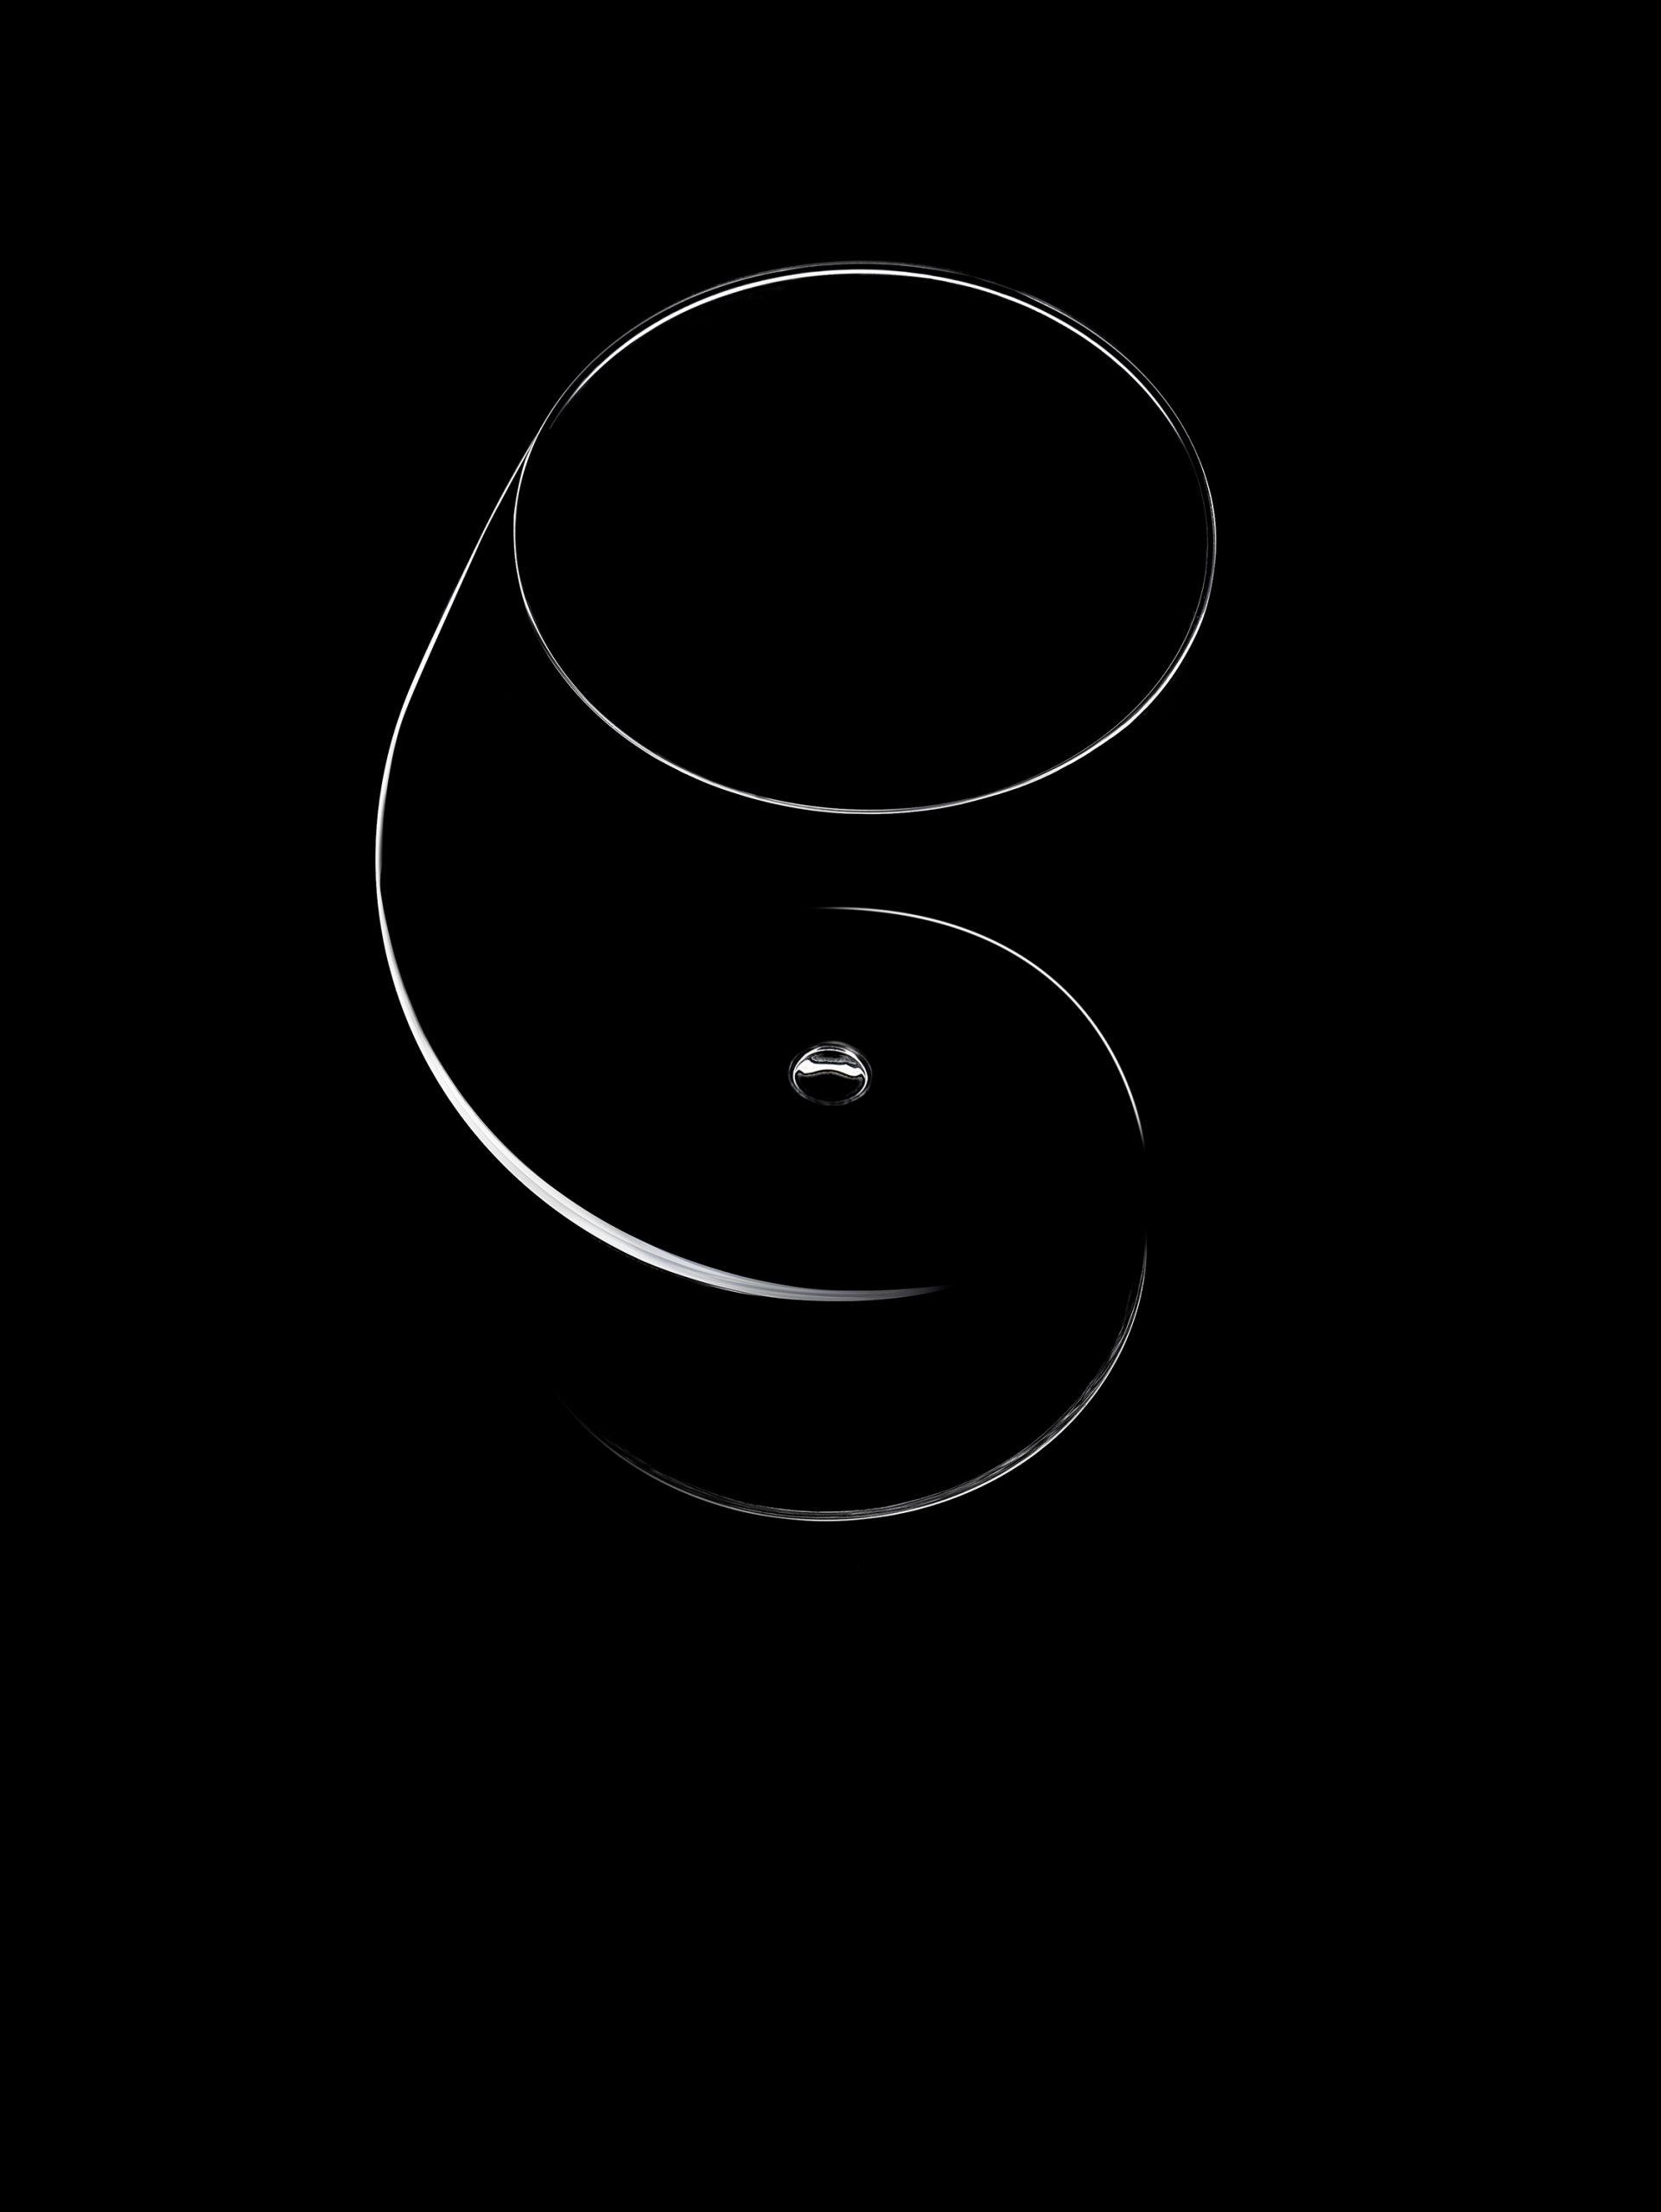 Wren-Agency-Richard-Foster-Overview-40